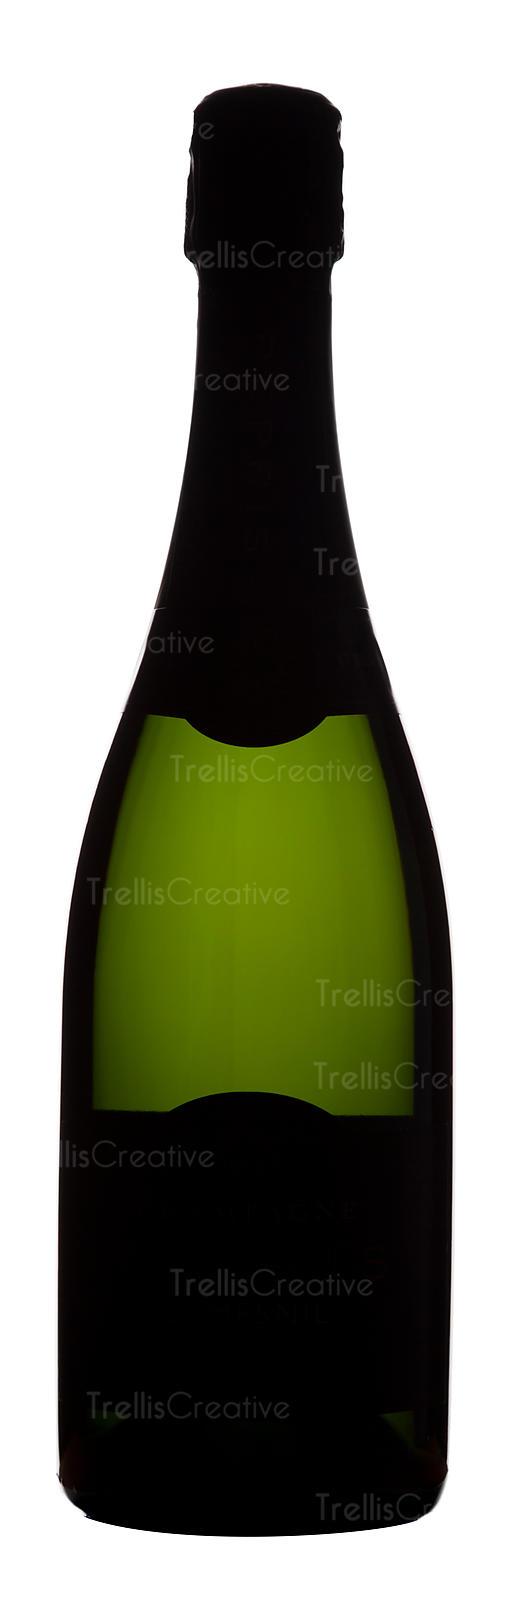 514x1600 Trellis Creative Wine Bottles